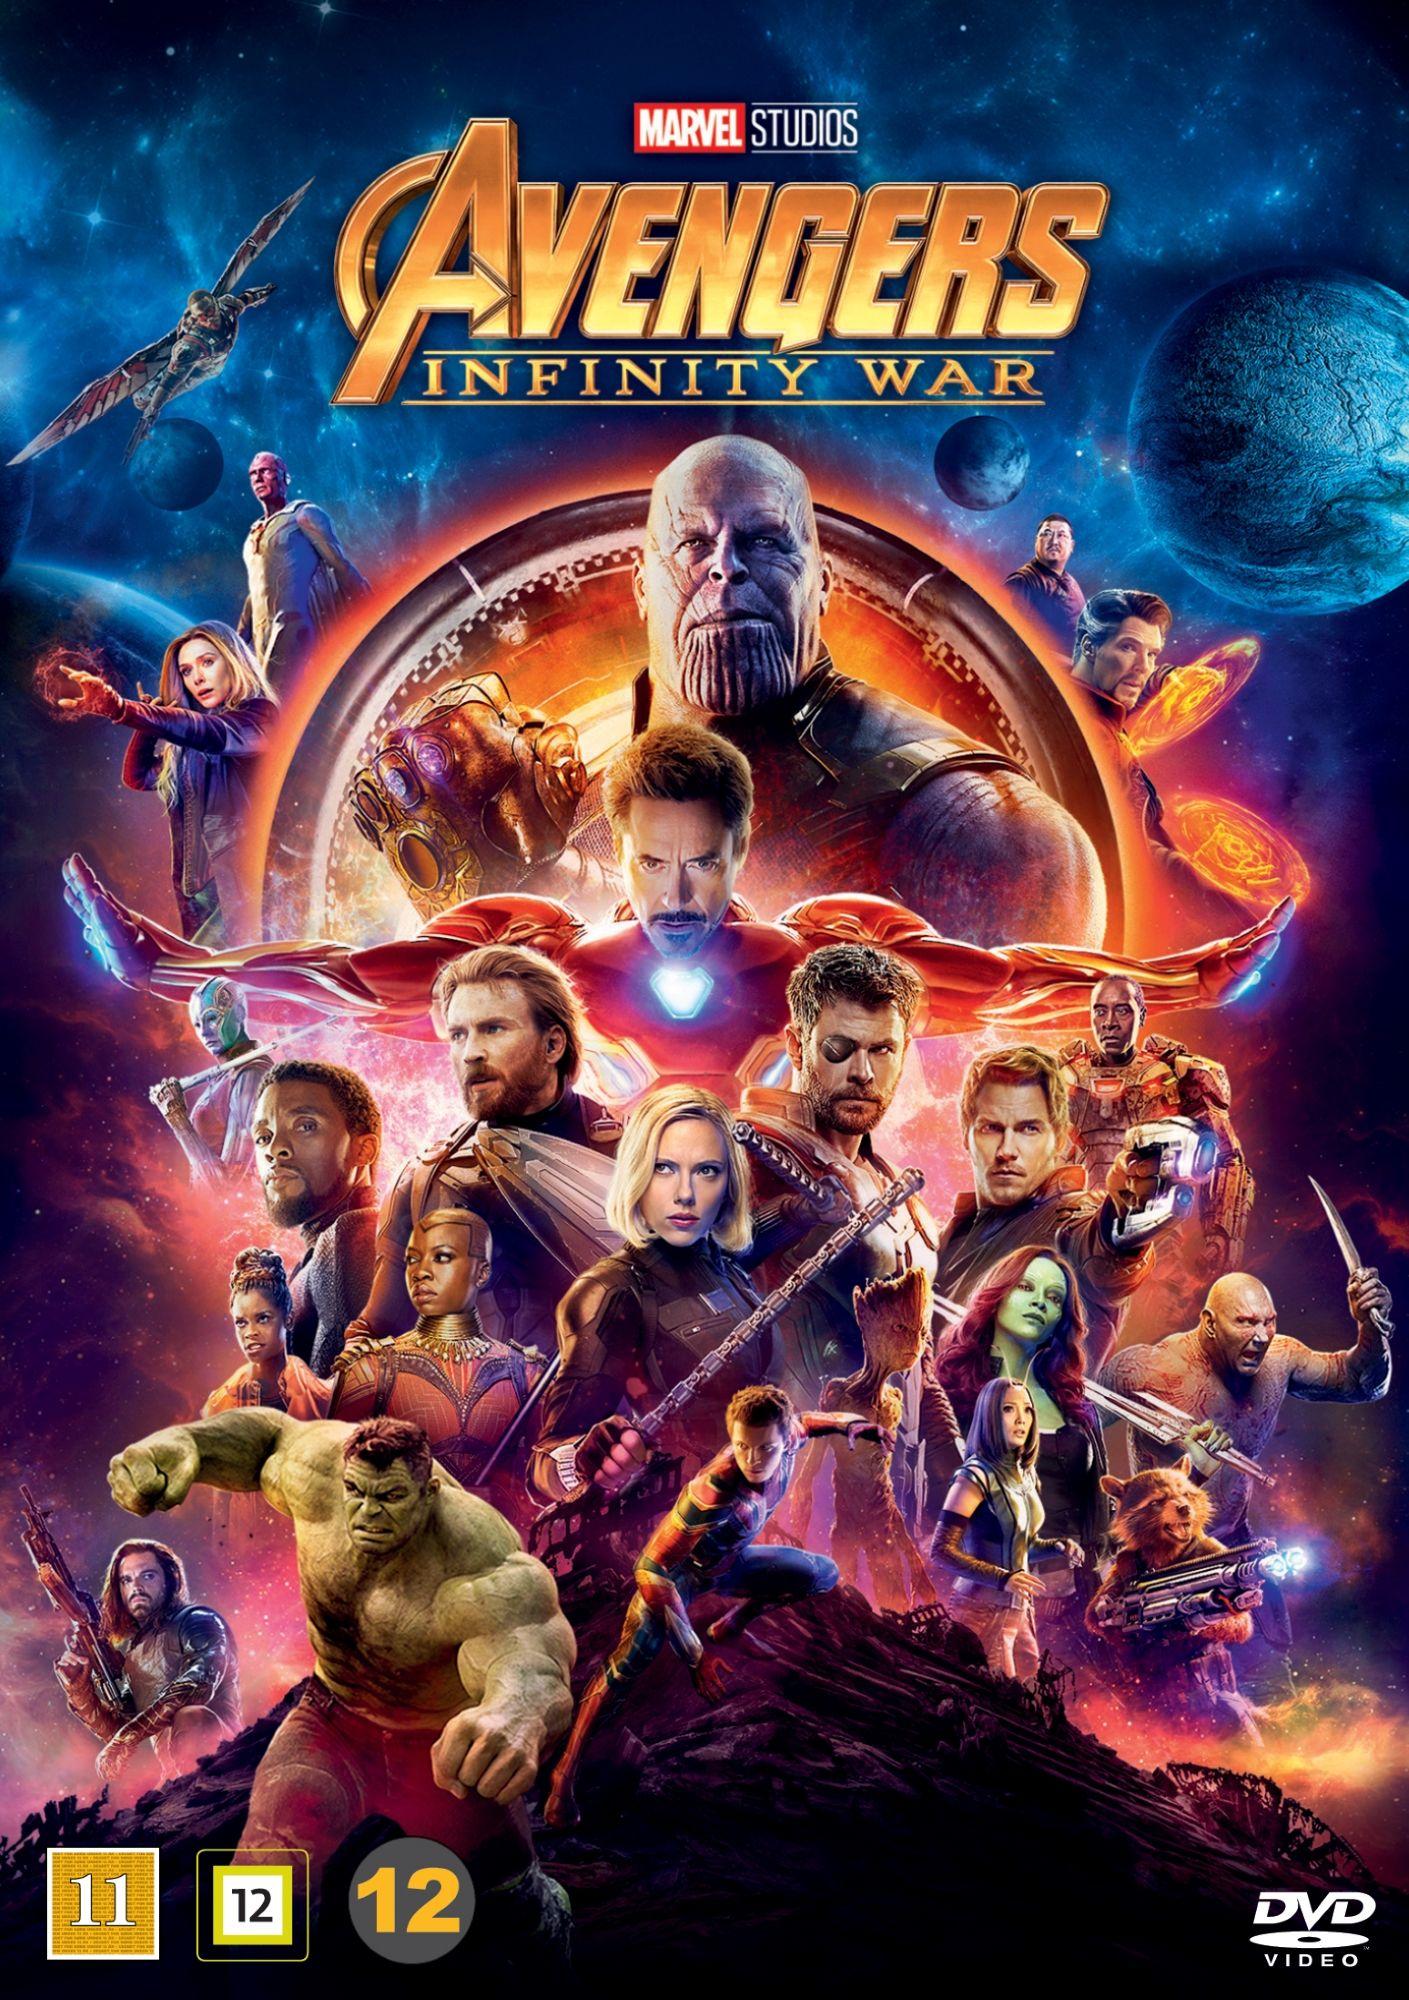 Poster A2 Vengadores Avengers Infinity War Spiderman Gemas Del Infinito Marvel